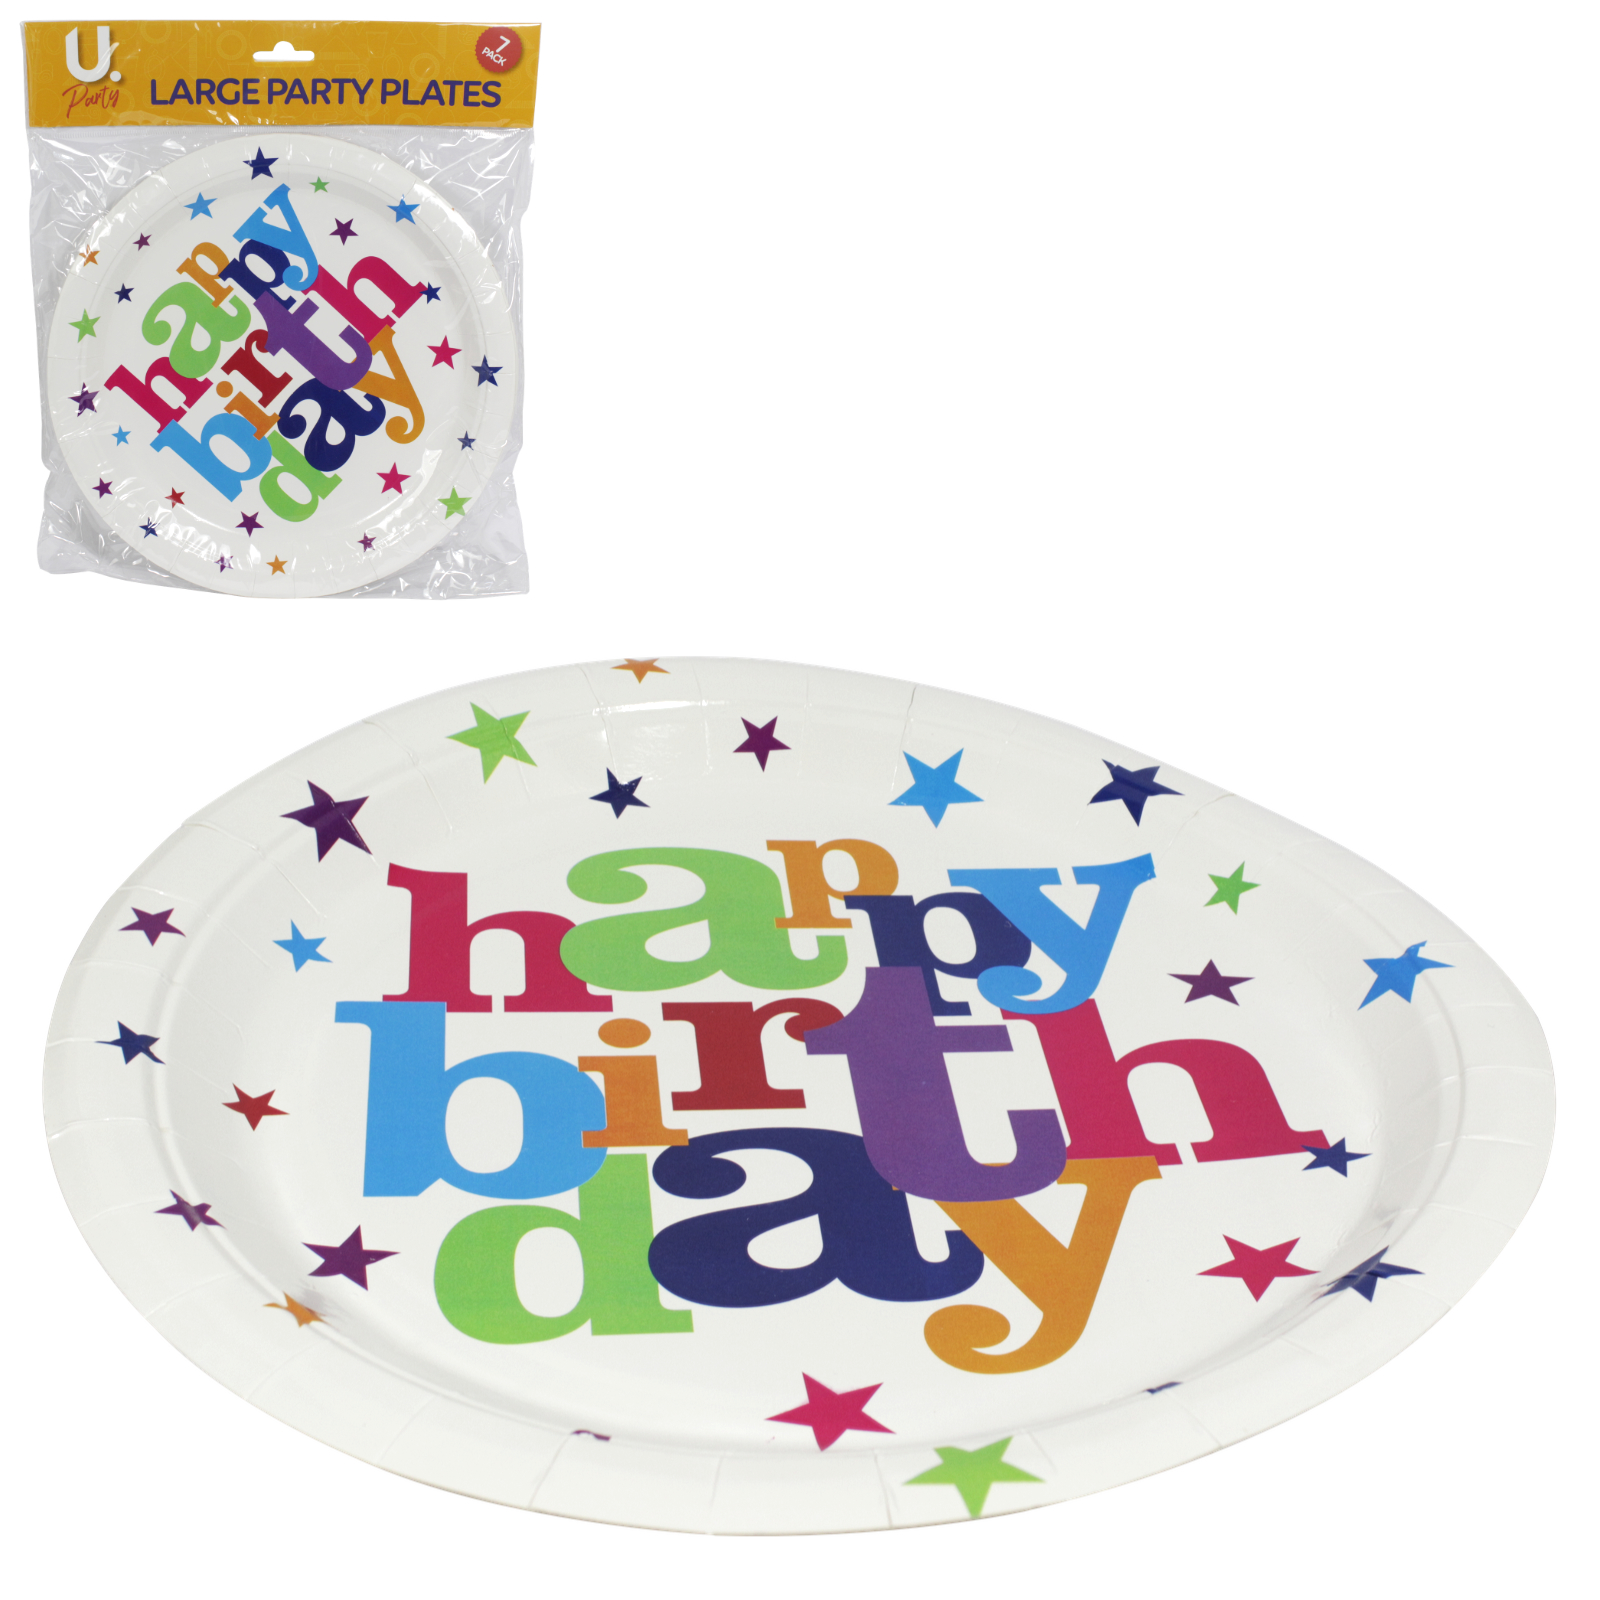 HAPPY BIRTHDAY PARTY PLATES 8X9